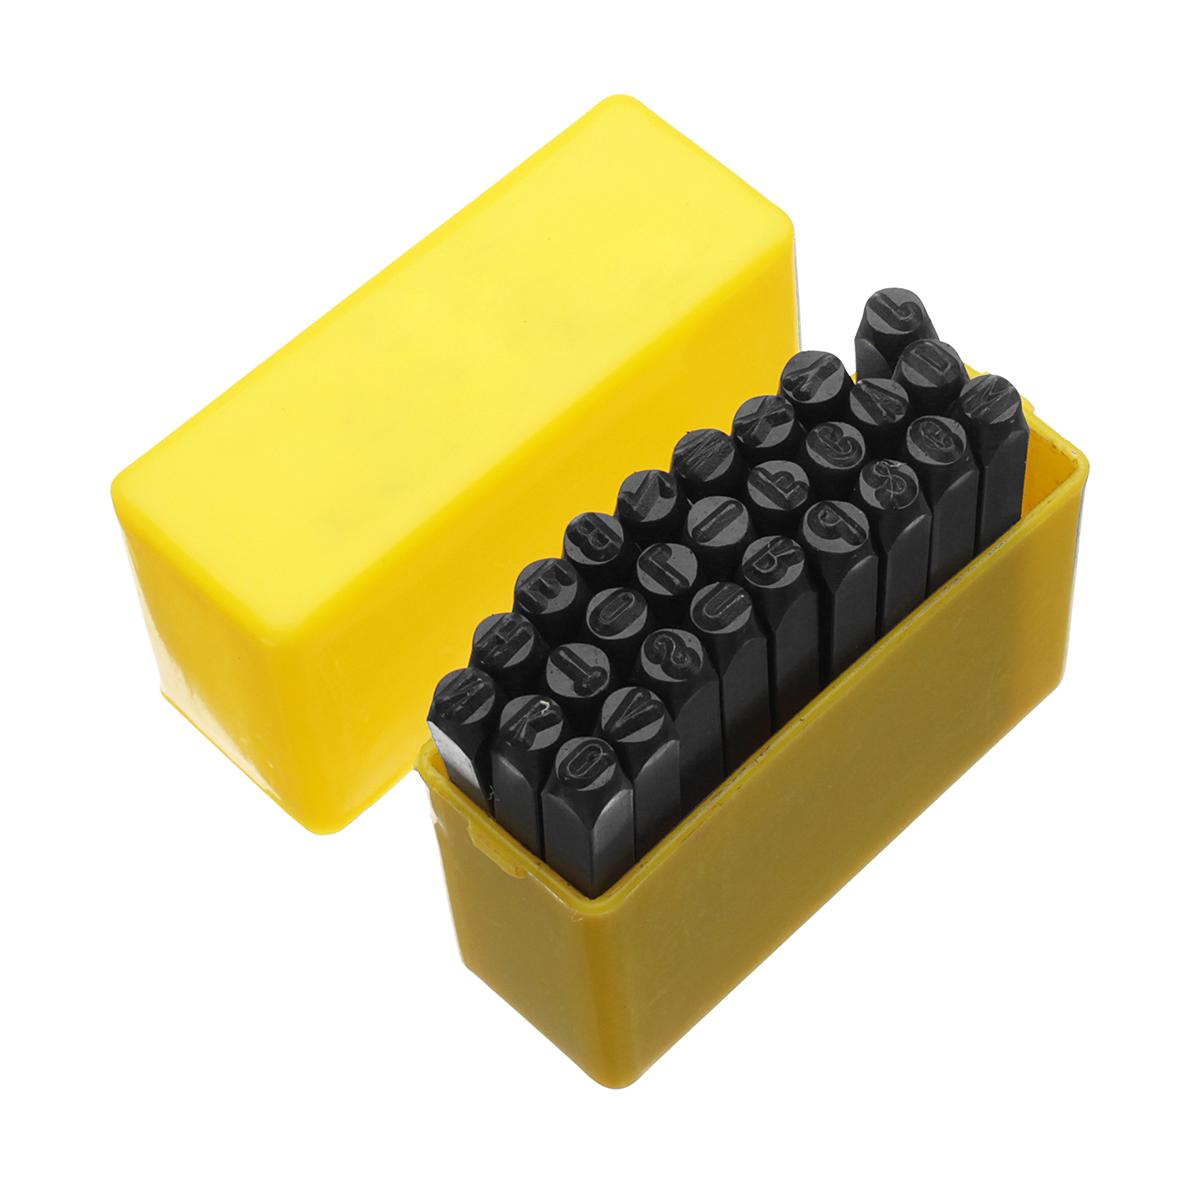 27pcs Alphabet Numbers Set Letter Steel Metal Die Stamp Punches Tool Set